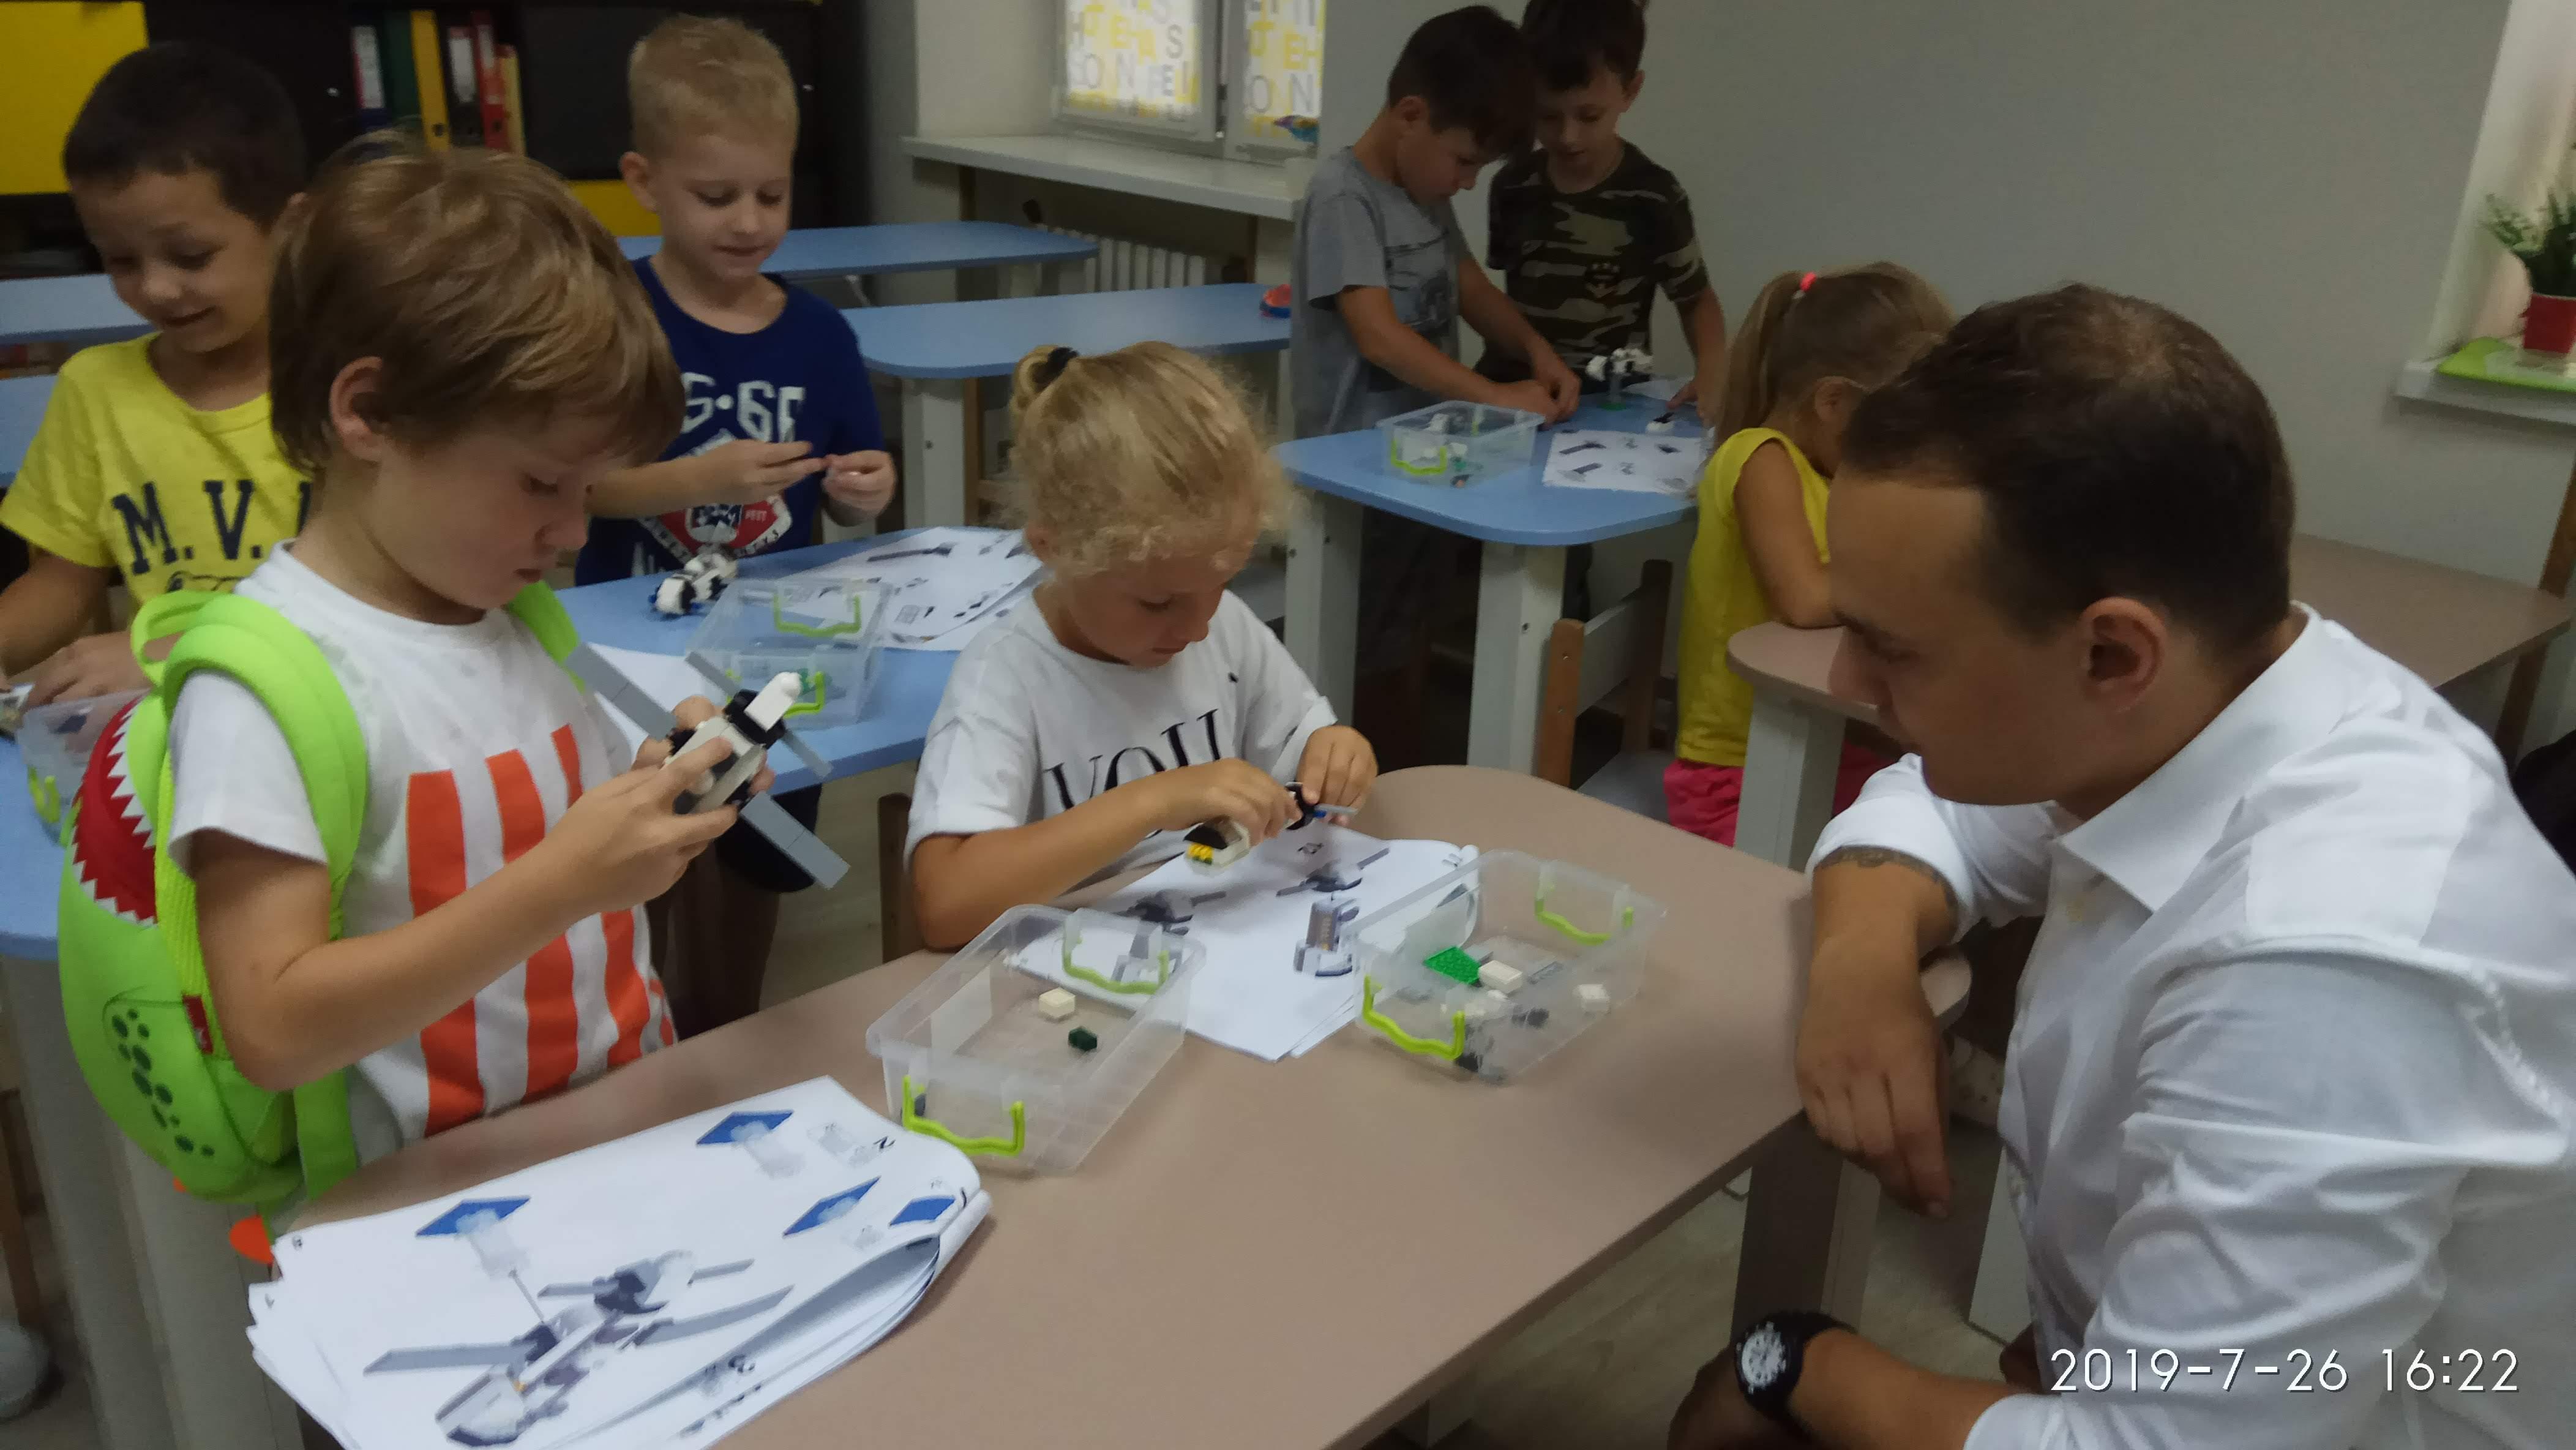 https://akademia-detstva.od.ua/app/uploads/2019/07/IMG_20190726_162254.jpg